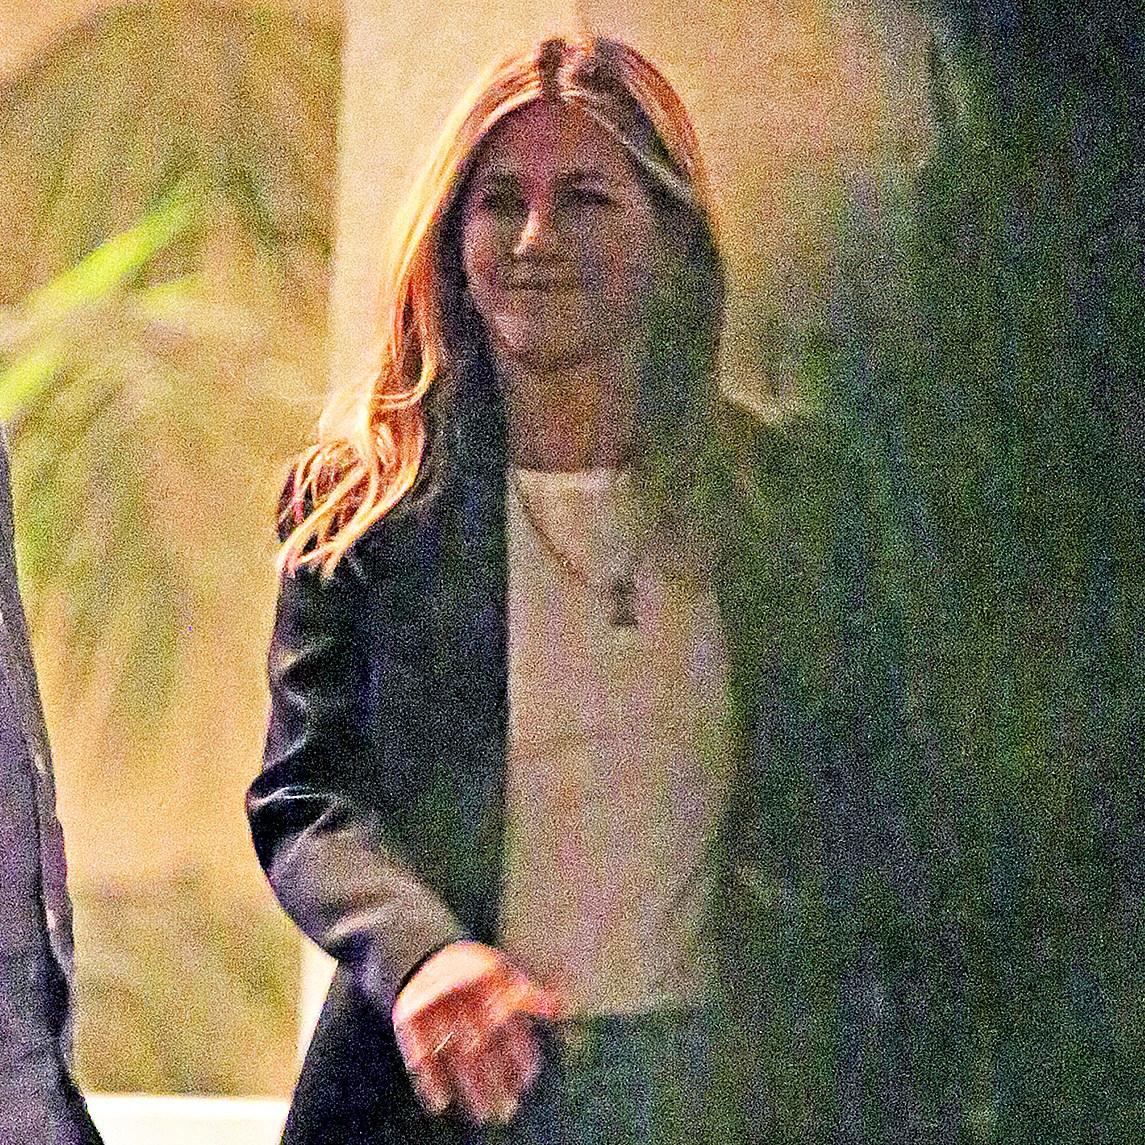 Jennifer Aniston smiling no ring